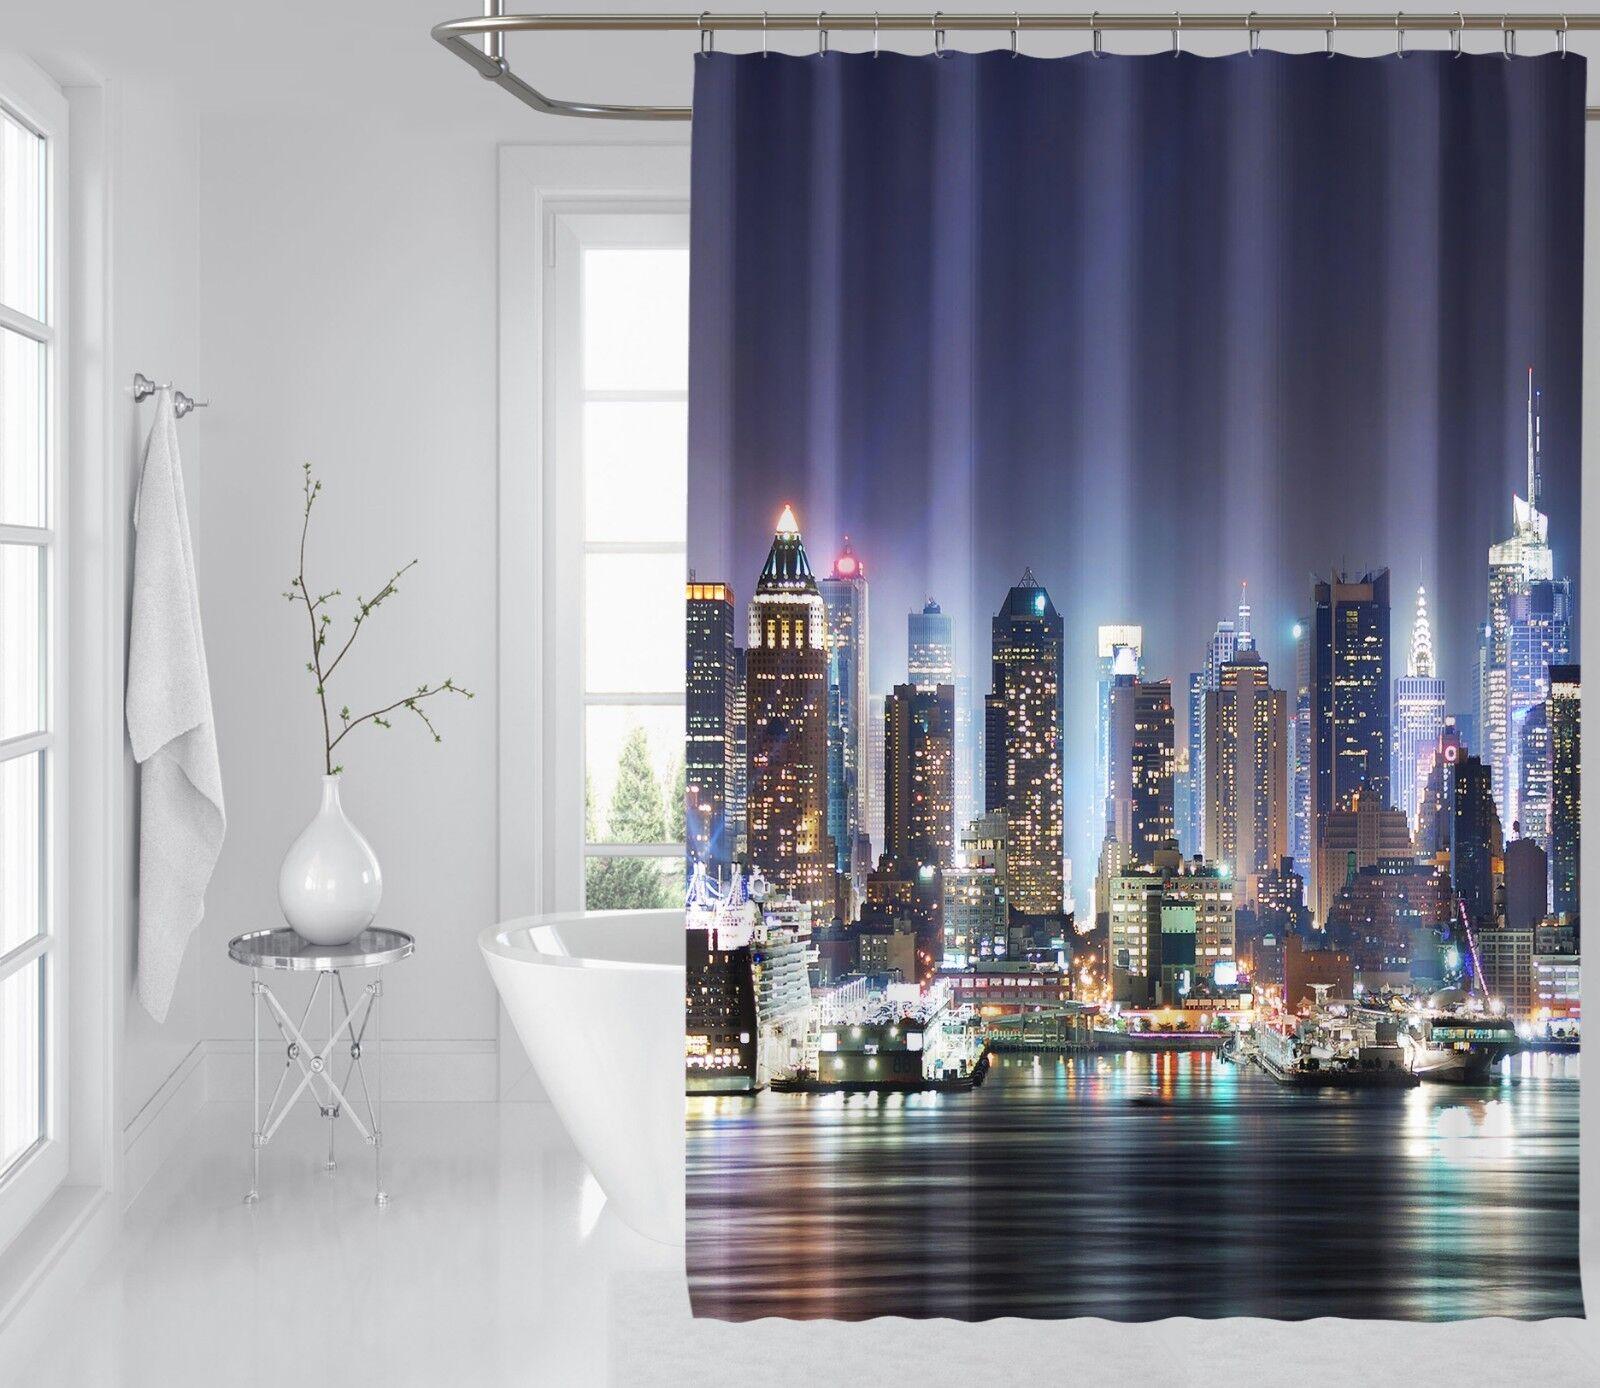 3D City Night View 8 Shower Curtain Waterproof Fiber Bathroom Windows Toilet Ea0e81